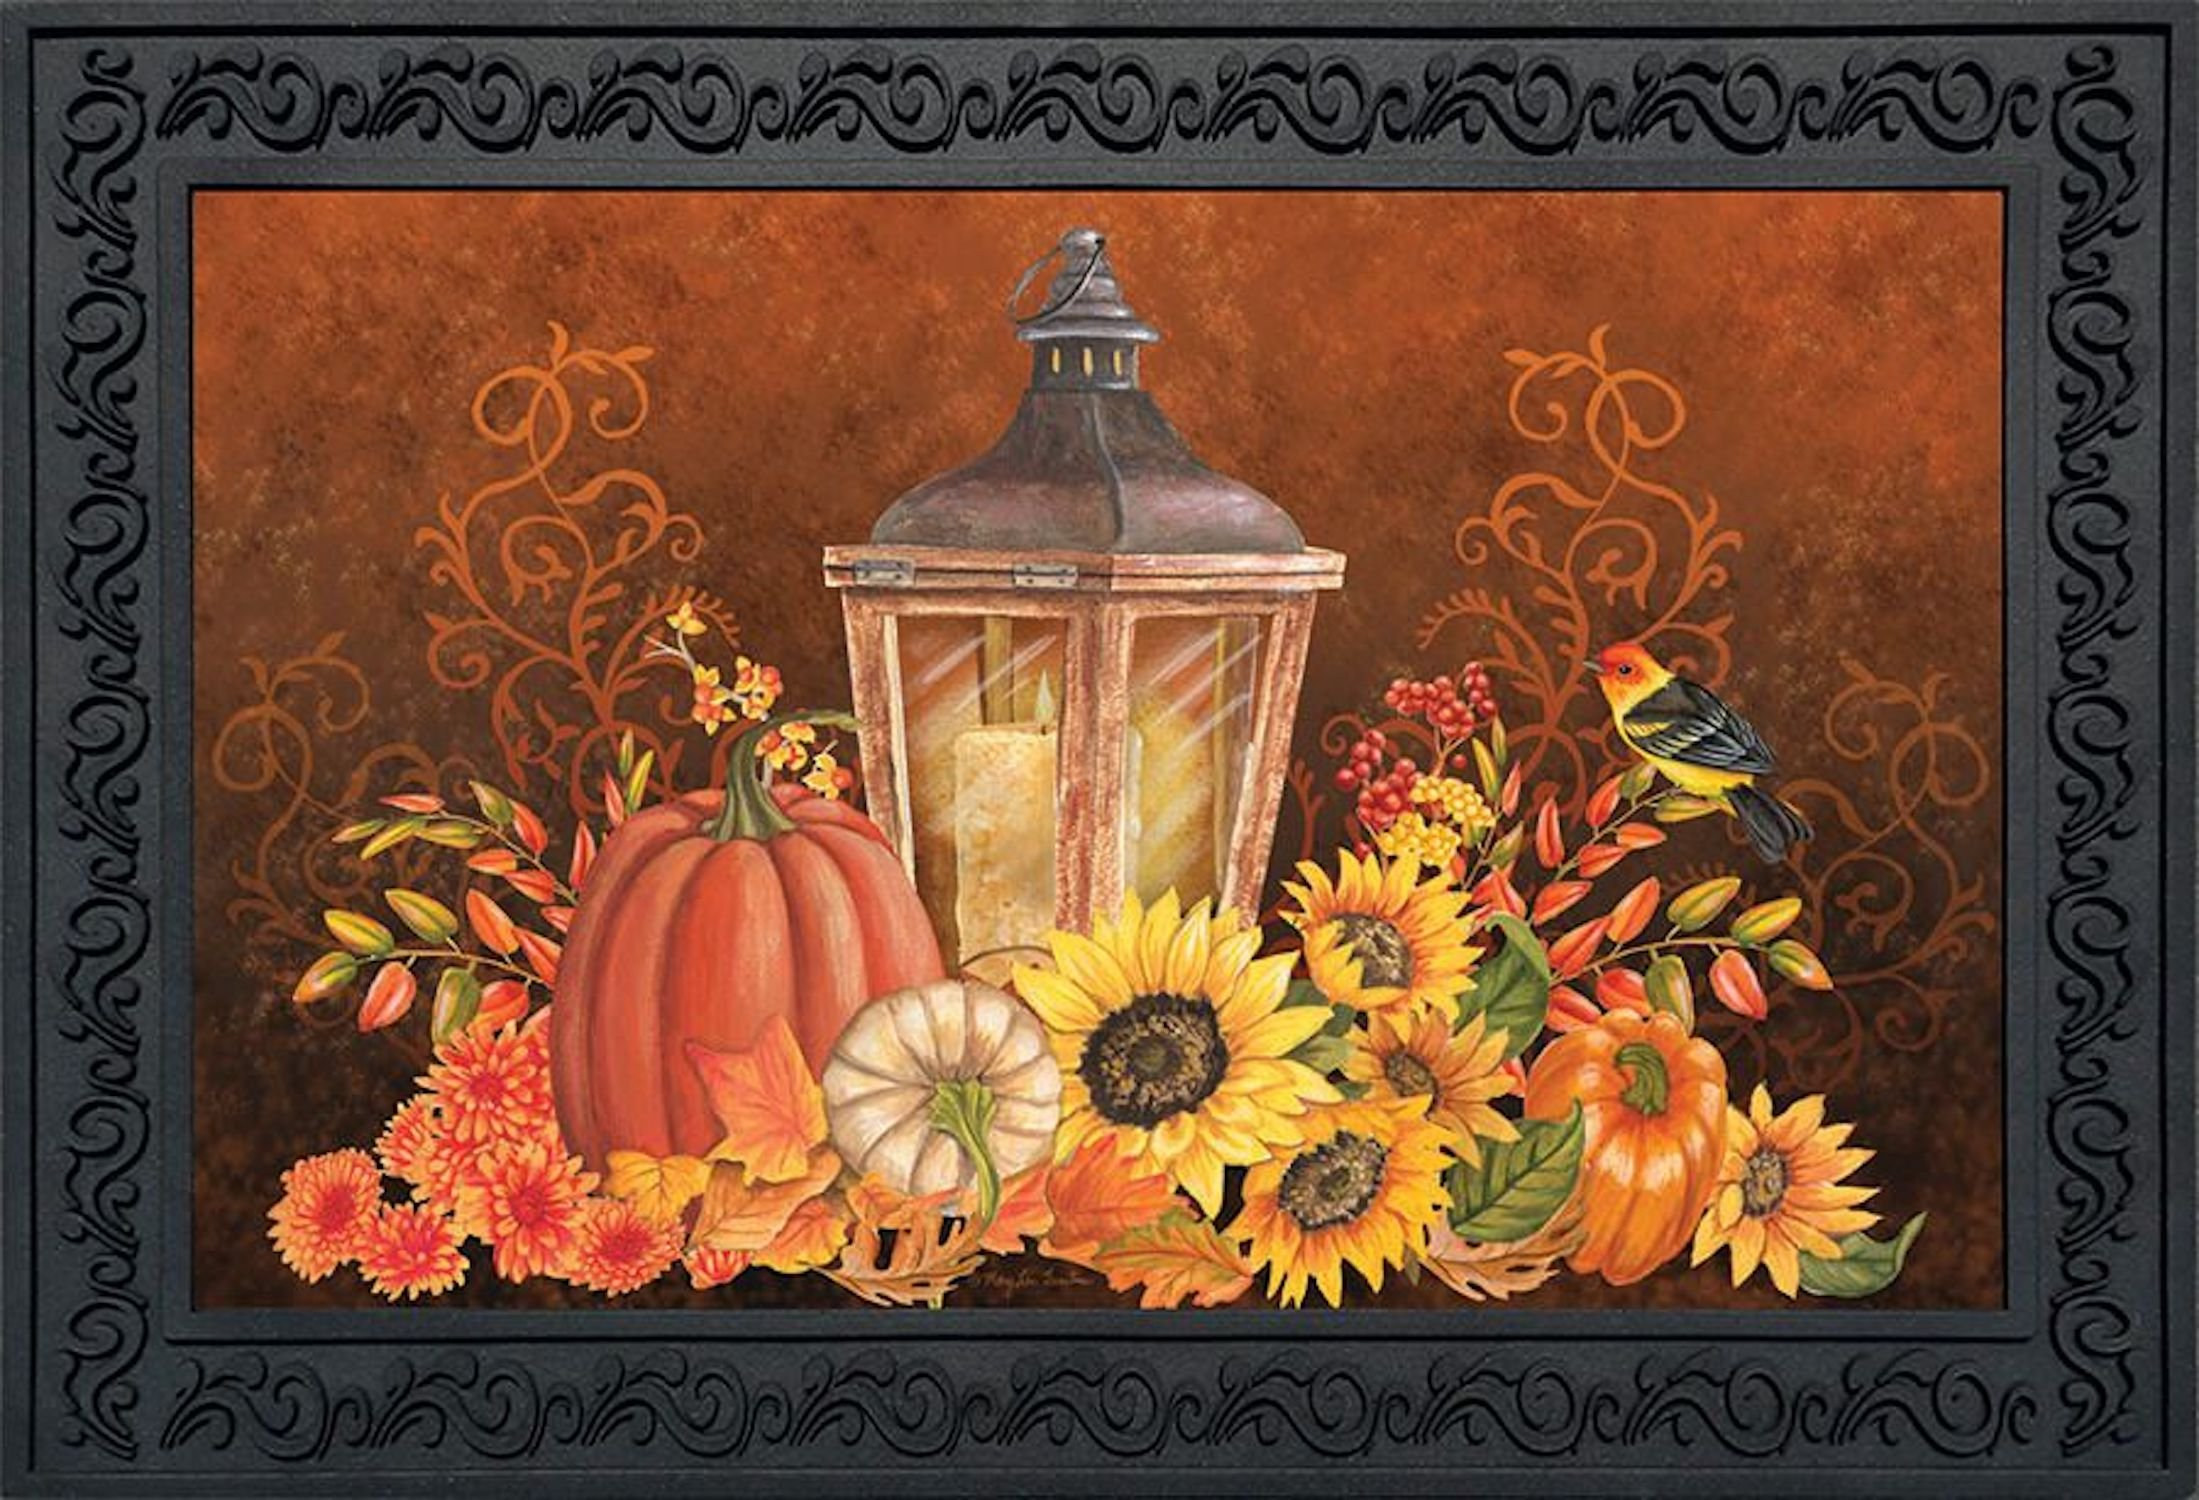 Briarwood Lane Fall Lantern Primitive Doormat Pumpkins Sunflowers Indoor Outdoor 18'' x 30'' by Briarwood Lane